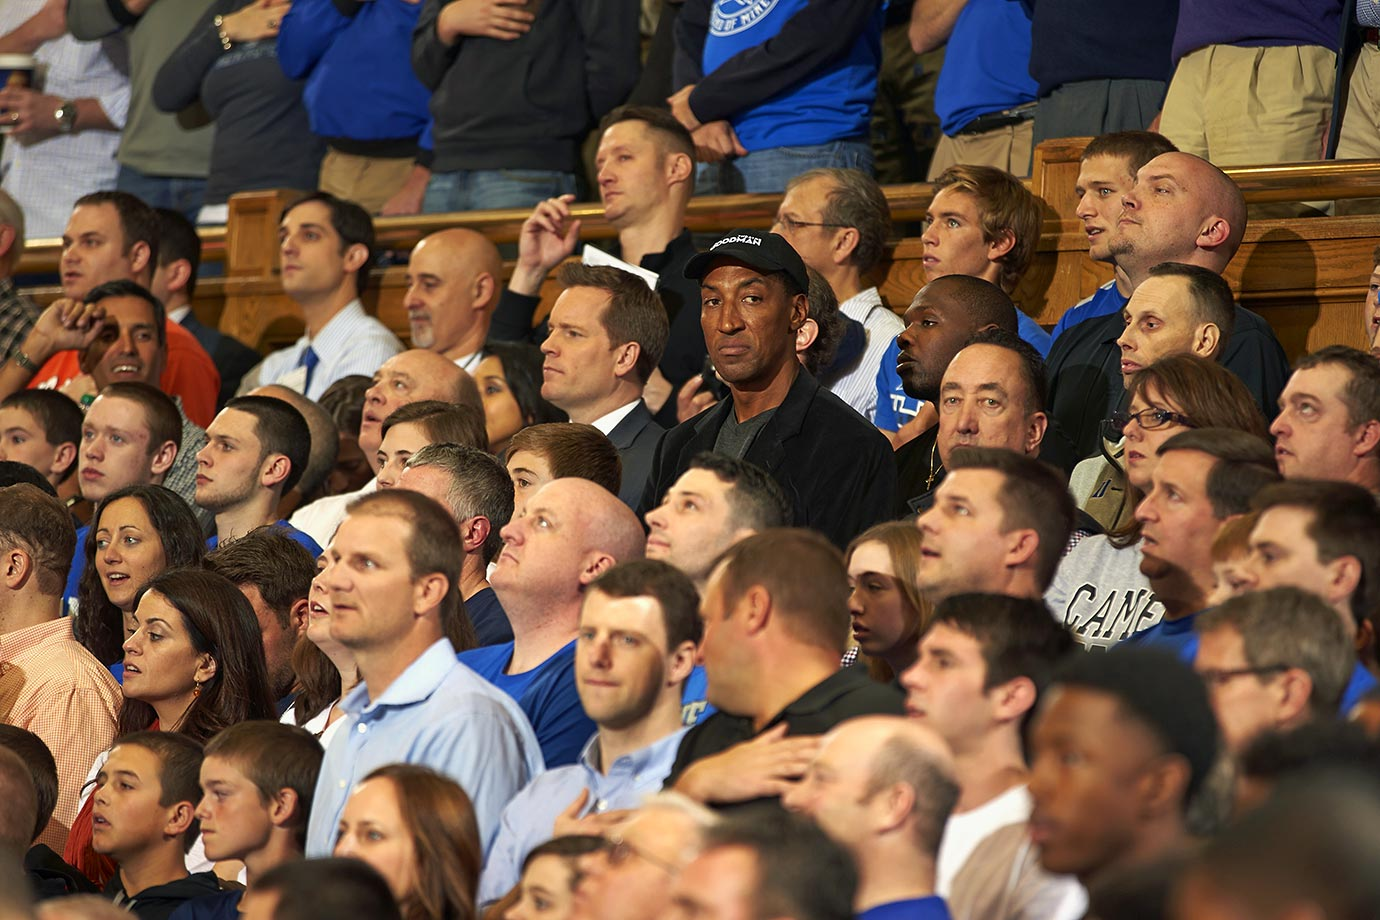 February 22, 2014 — Duke vs. Syracuse